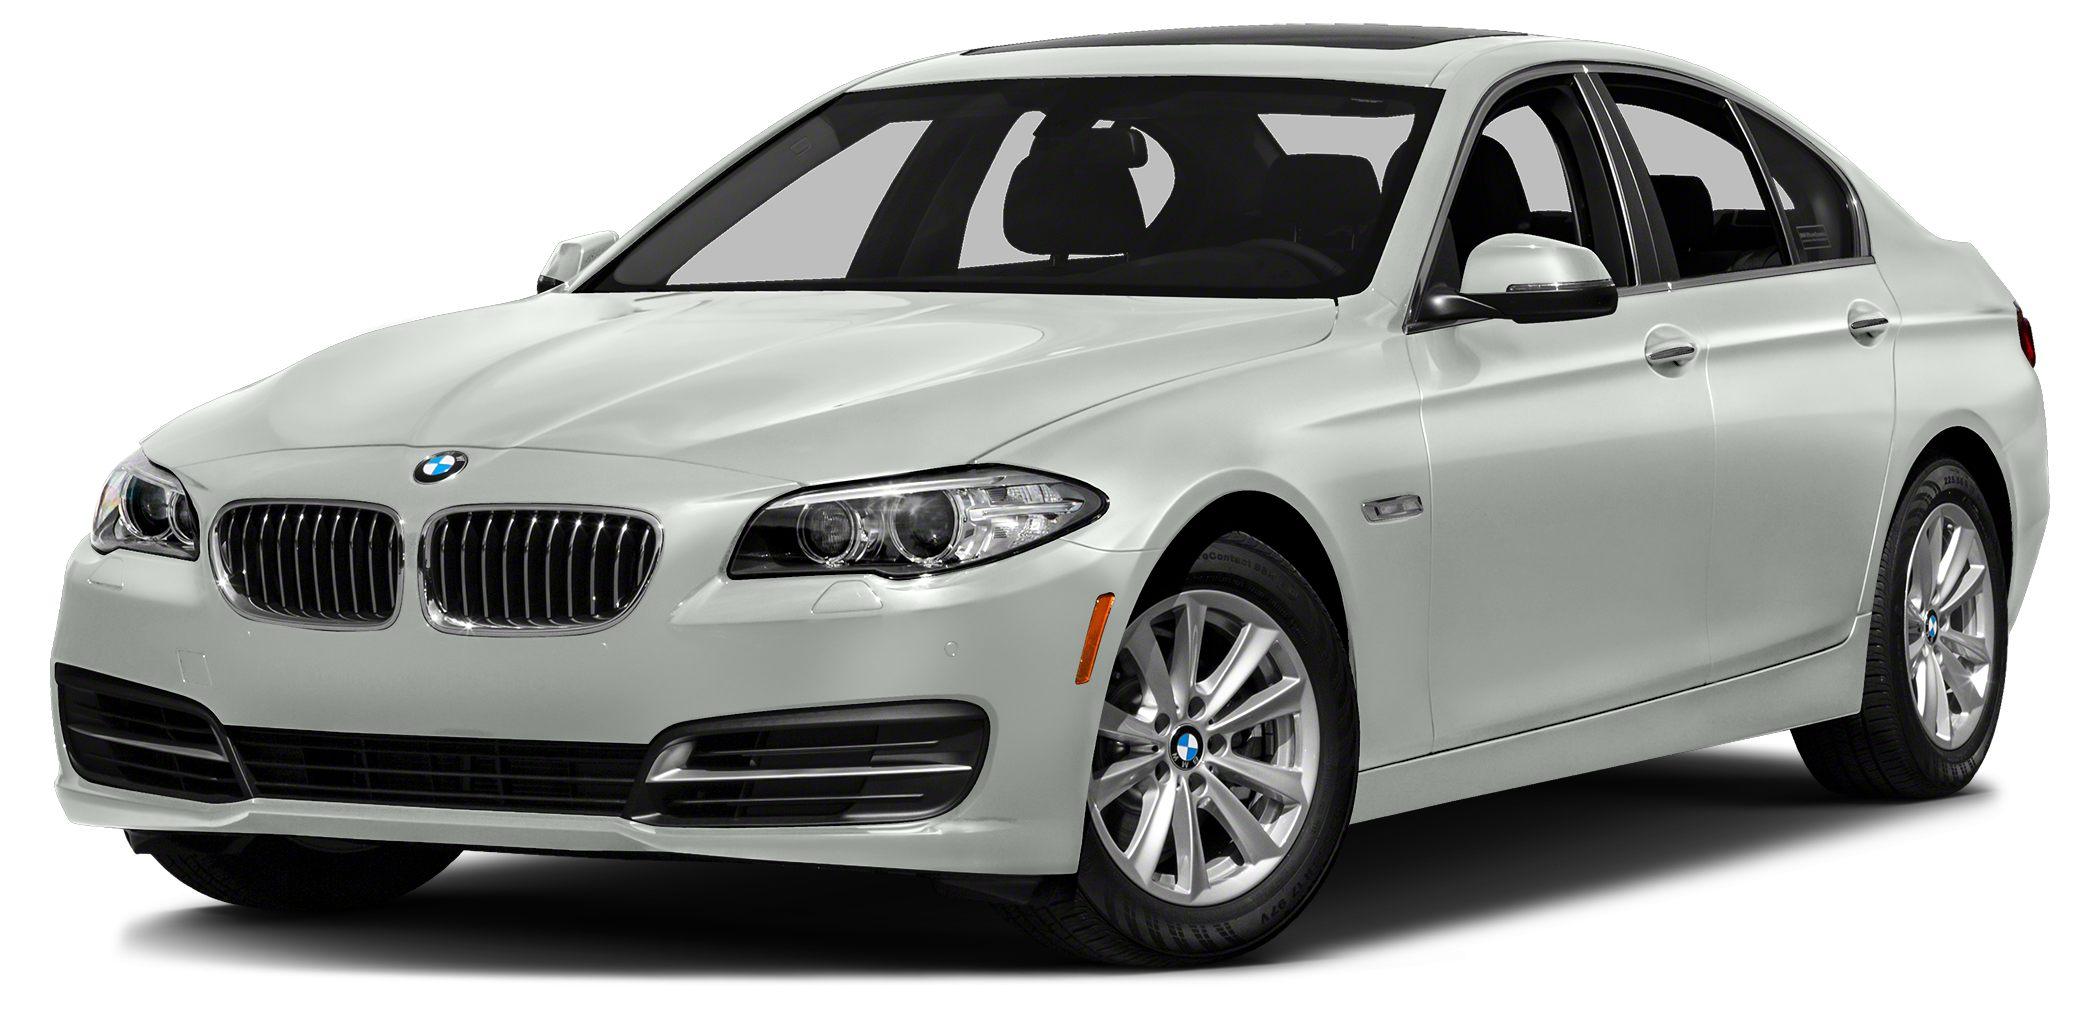 2014 BMW 535i Glam